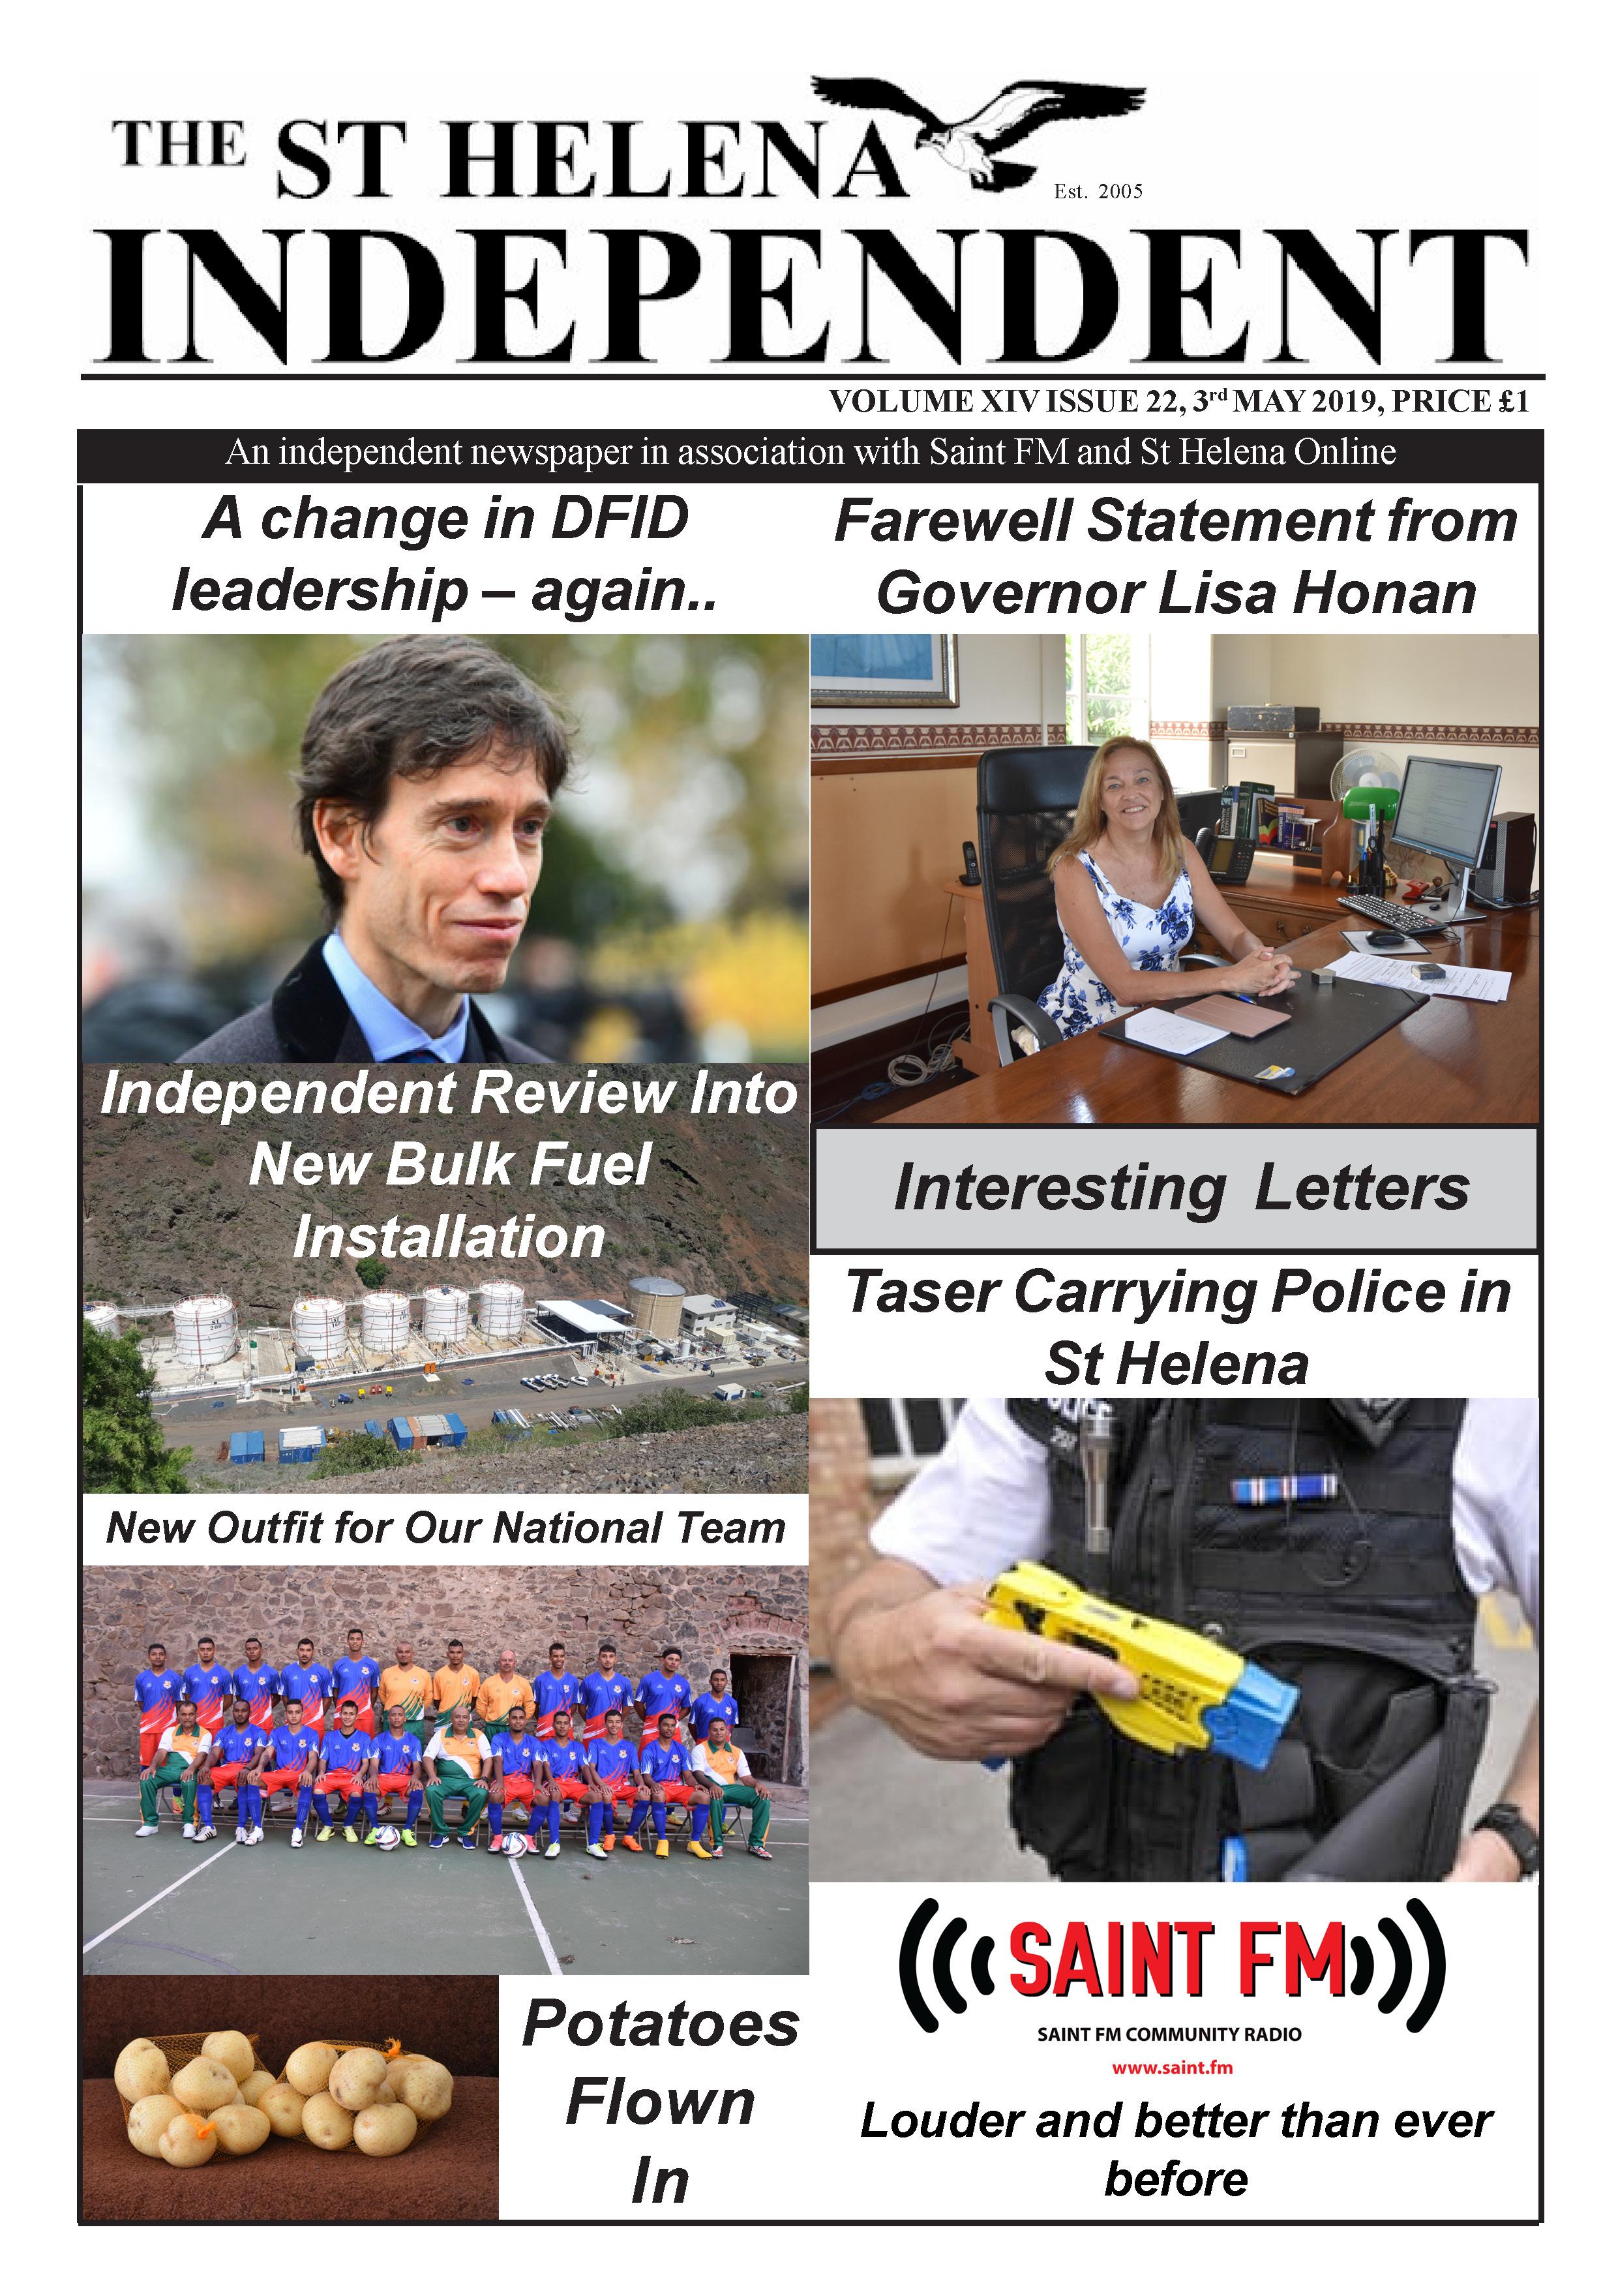 St Helena Independent 20190503